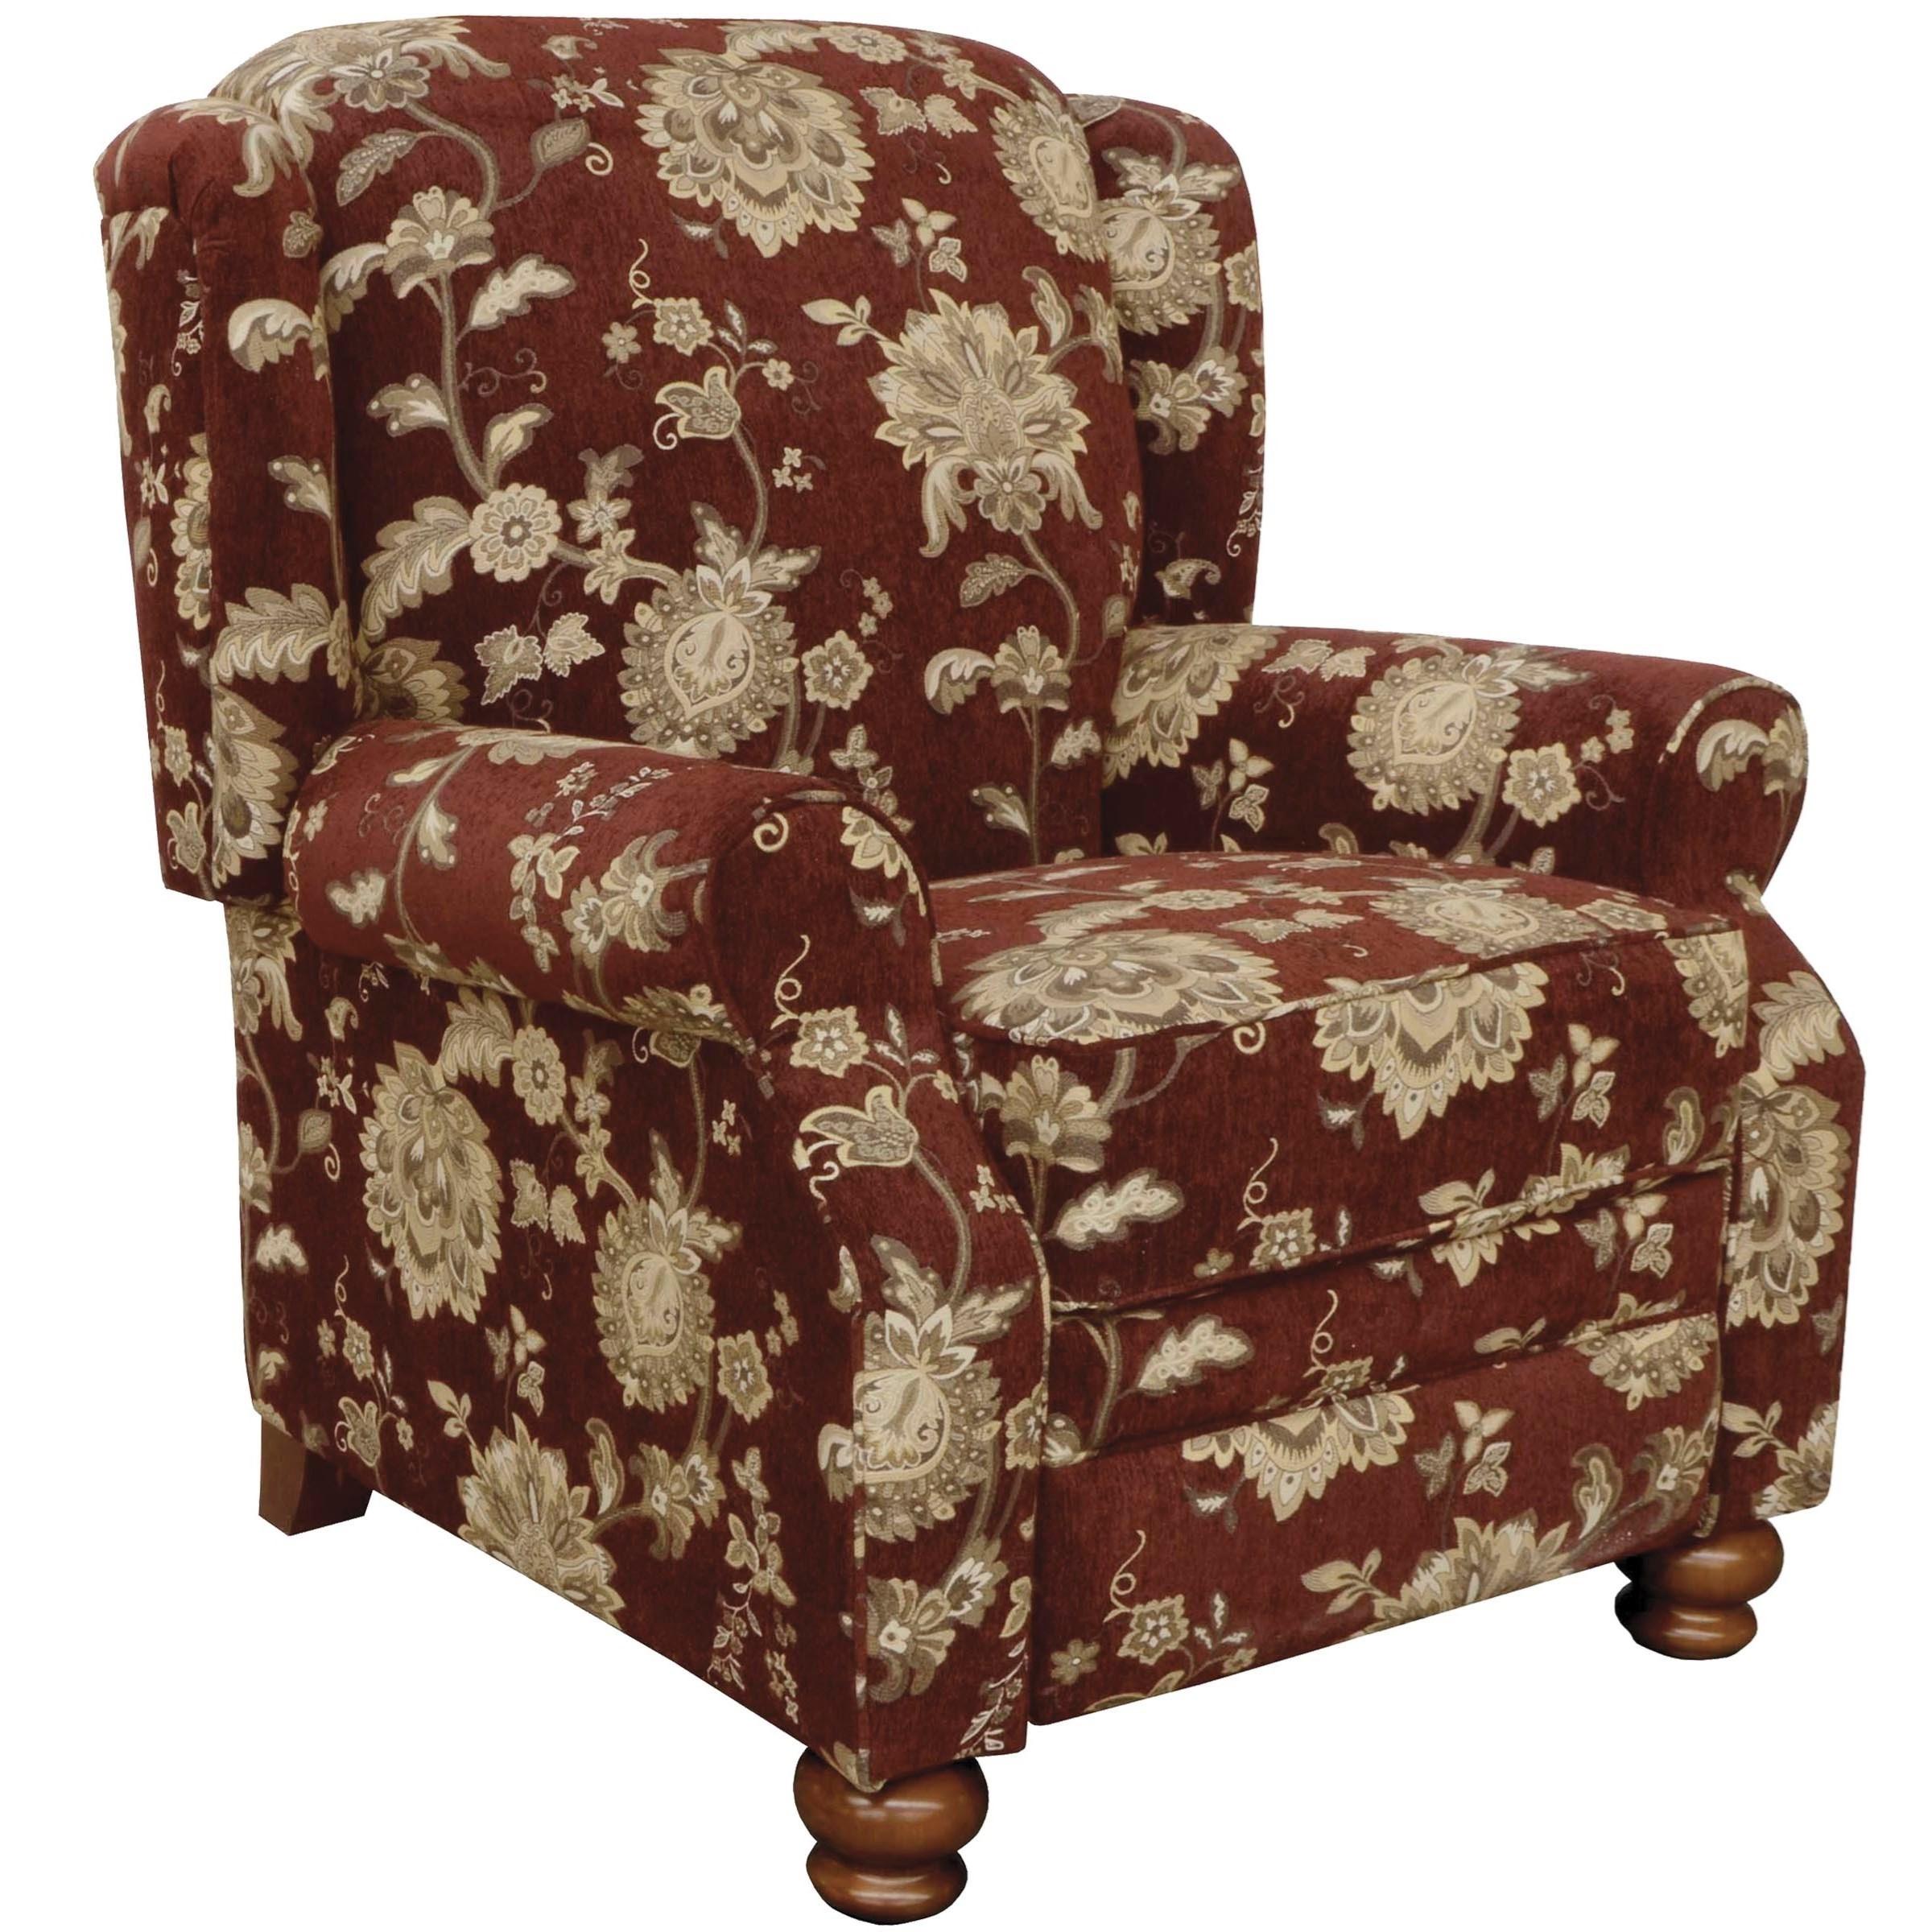 Jackson Furniture Belmont High Leg Recliner - Item Number: 4347-11-Belmont-Merlot